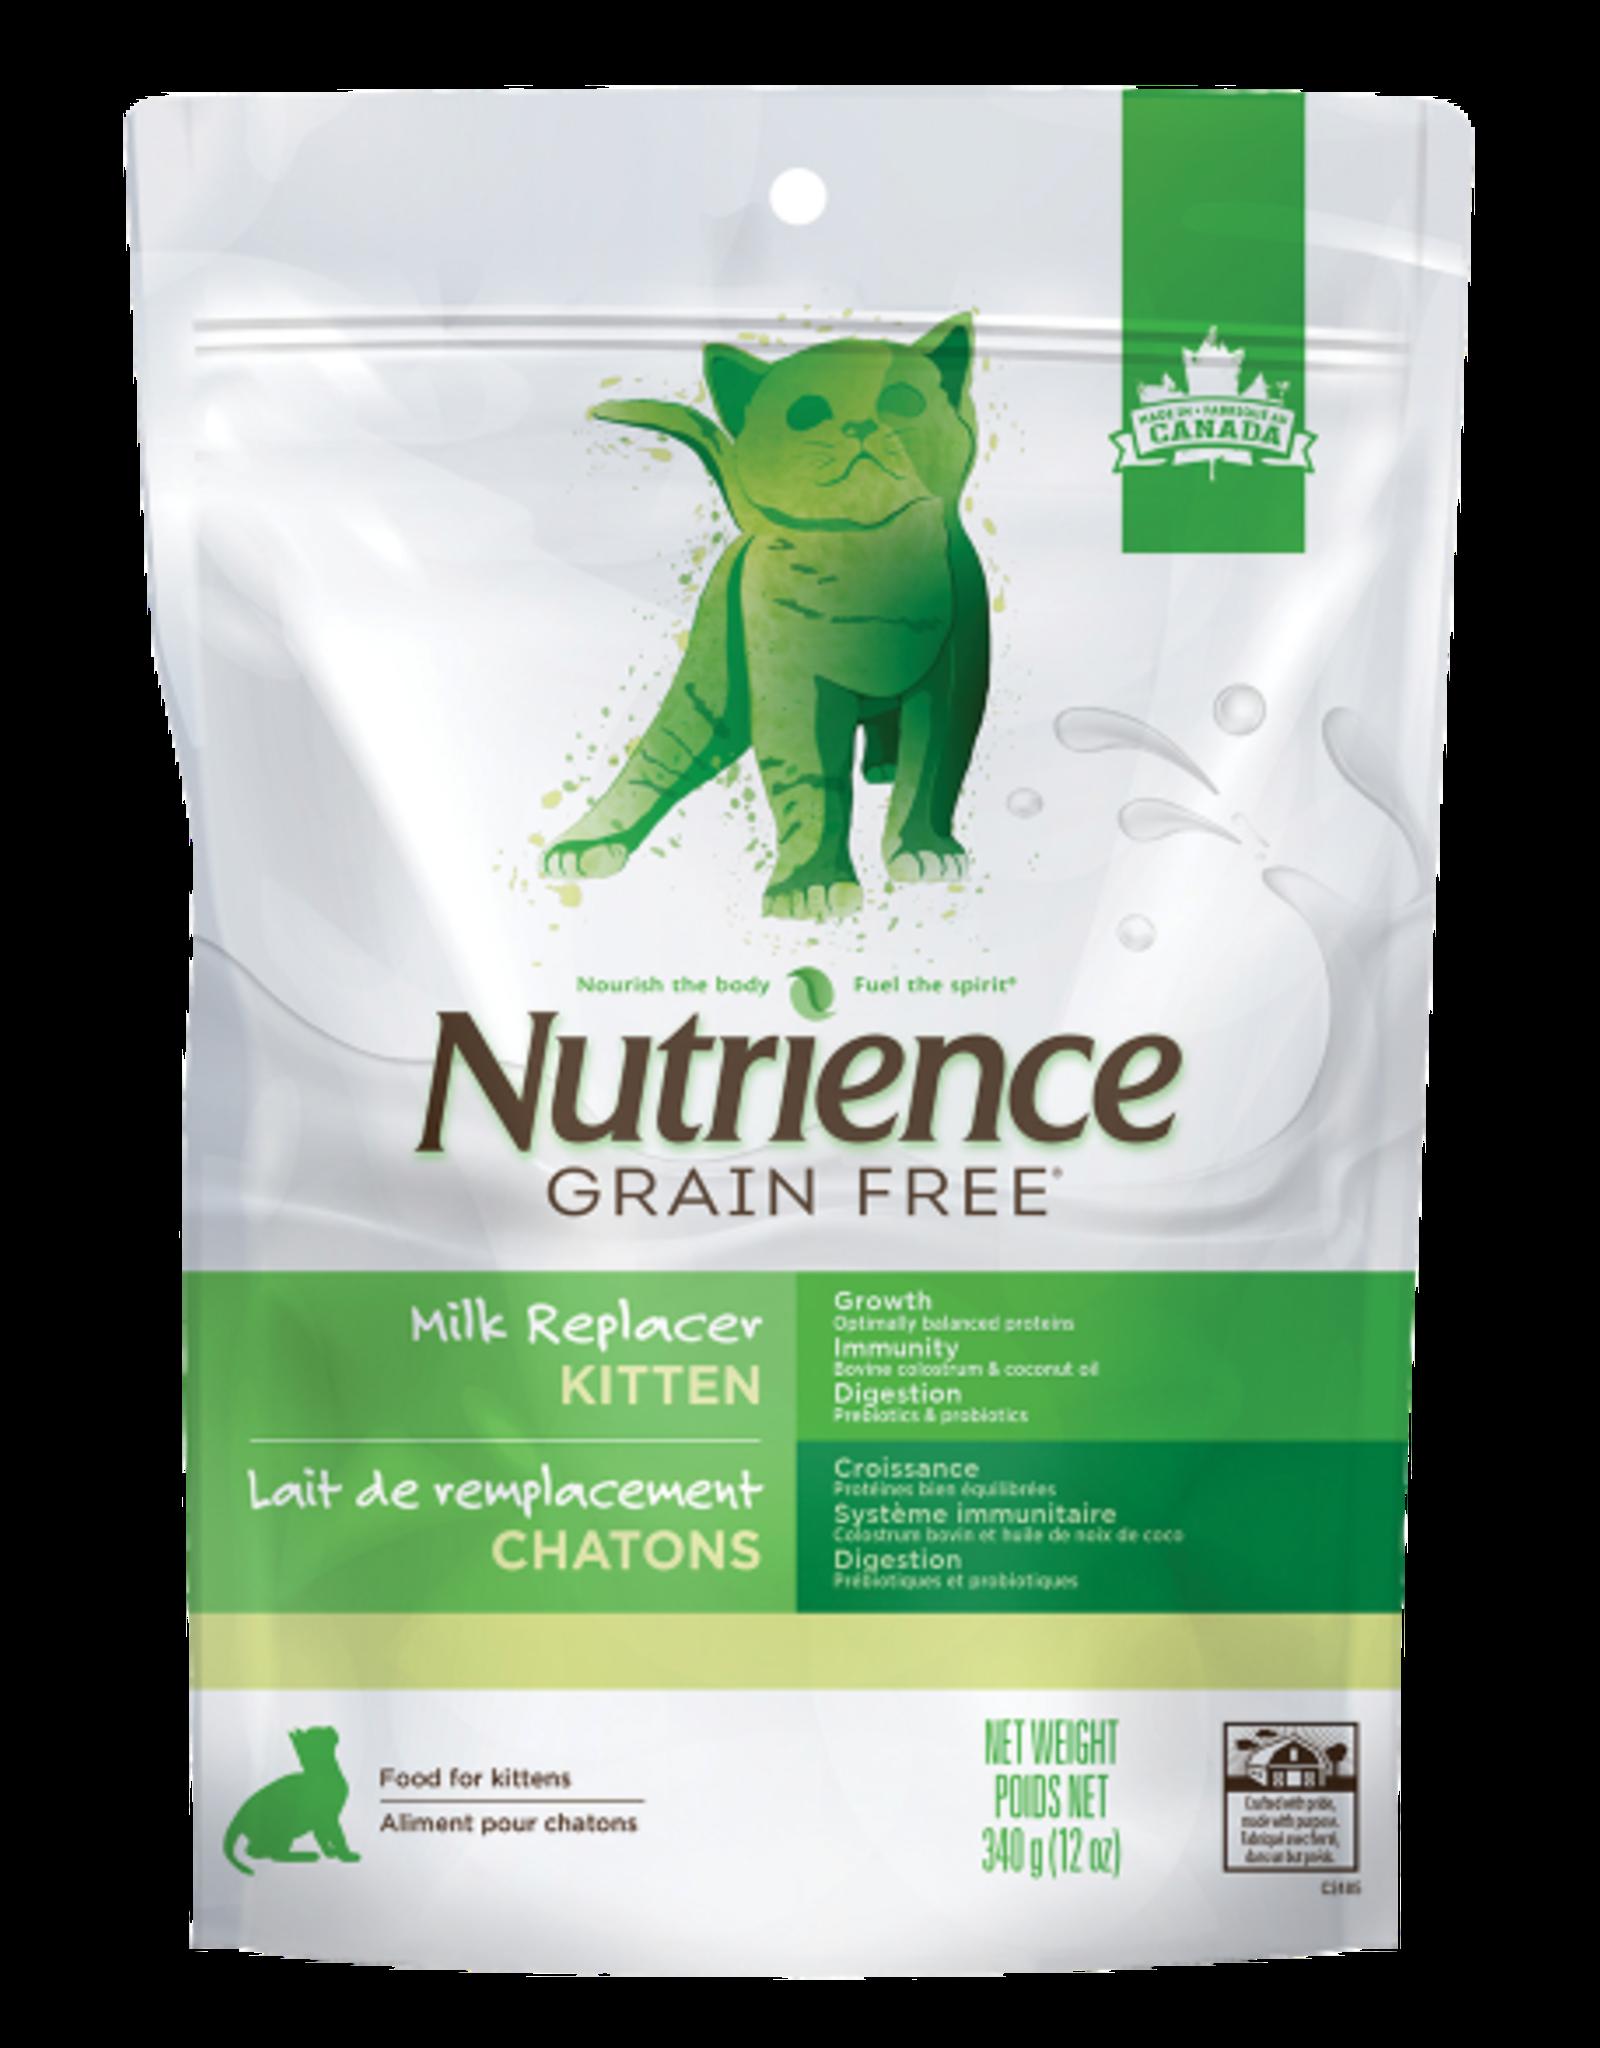 Nutrience Nutrience Grain Free Kitten Milk Replacer - 340g